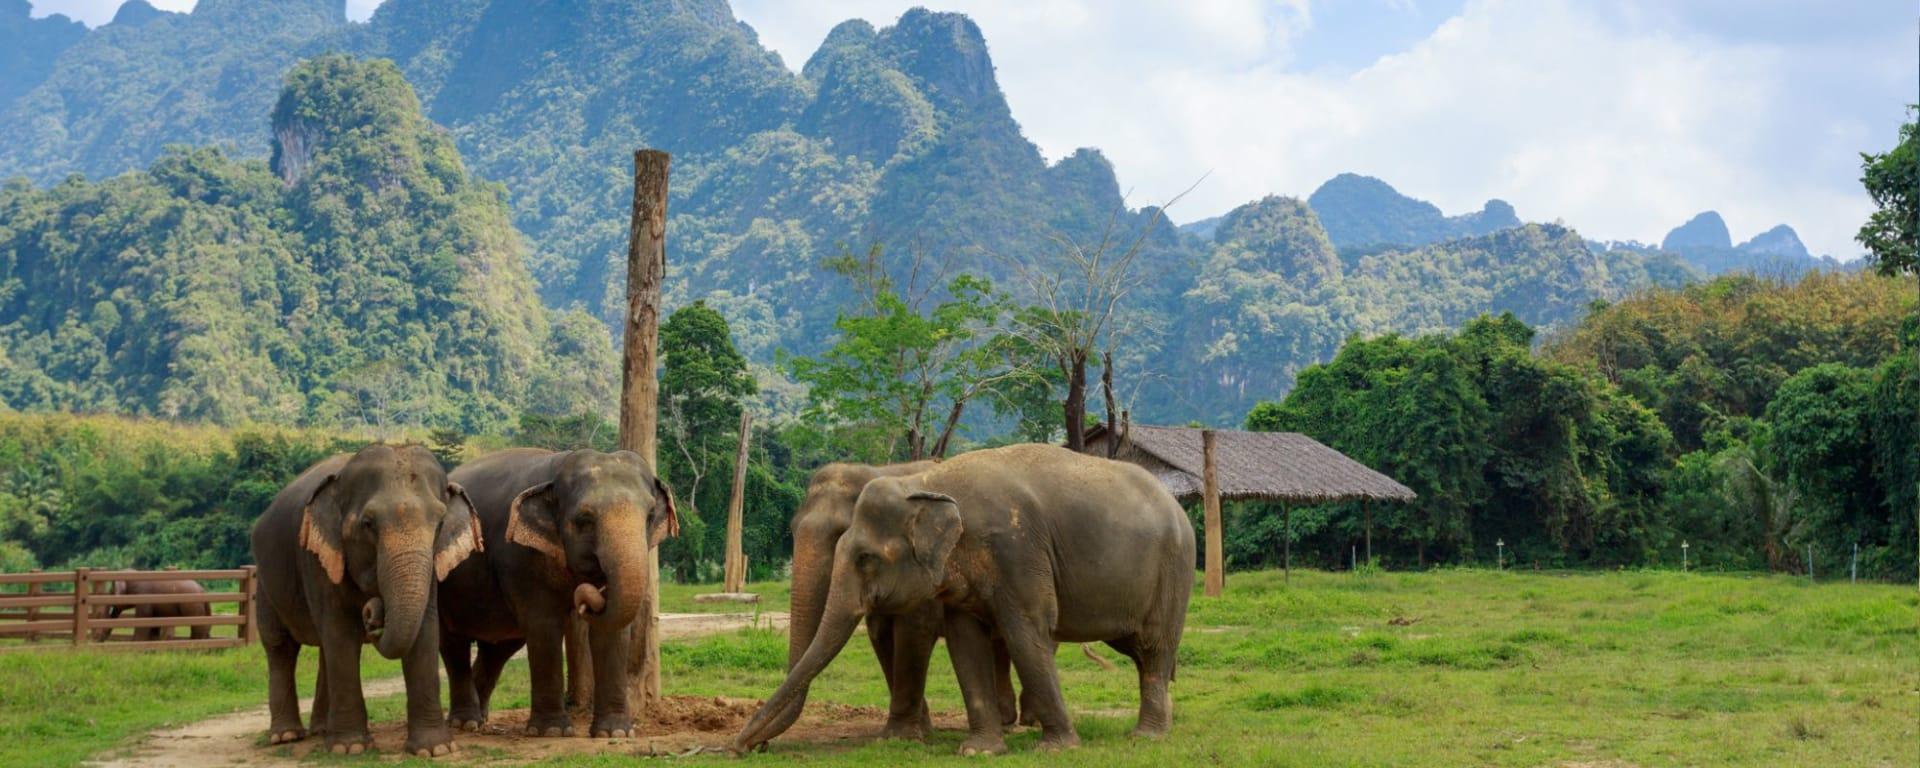 Elephant Hills - 3 jours de Phuket: Ethical Elephant Experience at Elephant Hills Luxury Tented Camp Khao Sok National Park Thailand - no Elephant Riding or Trekking